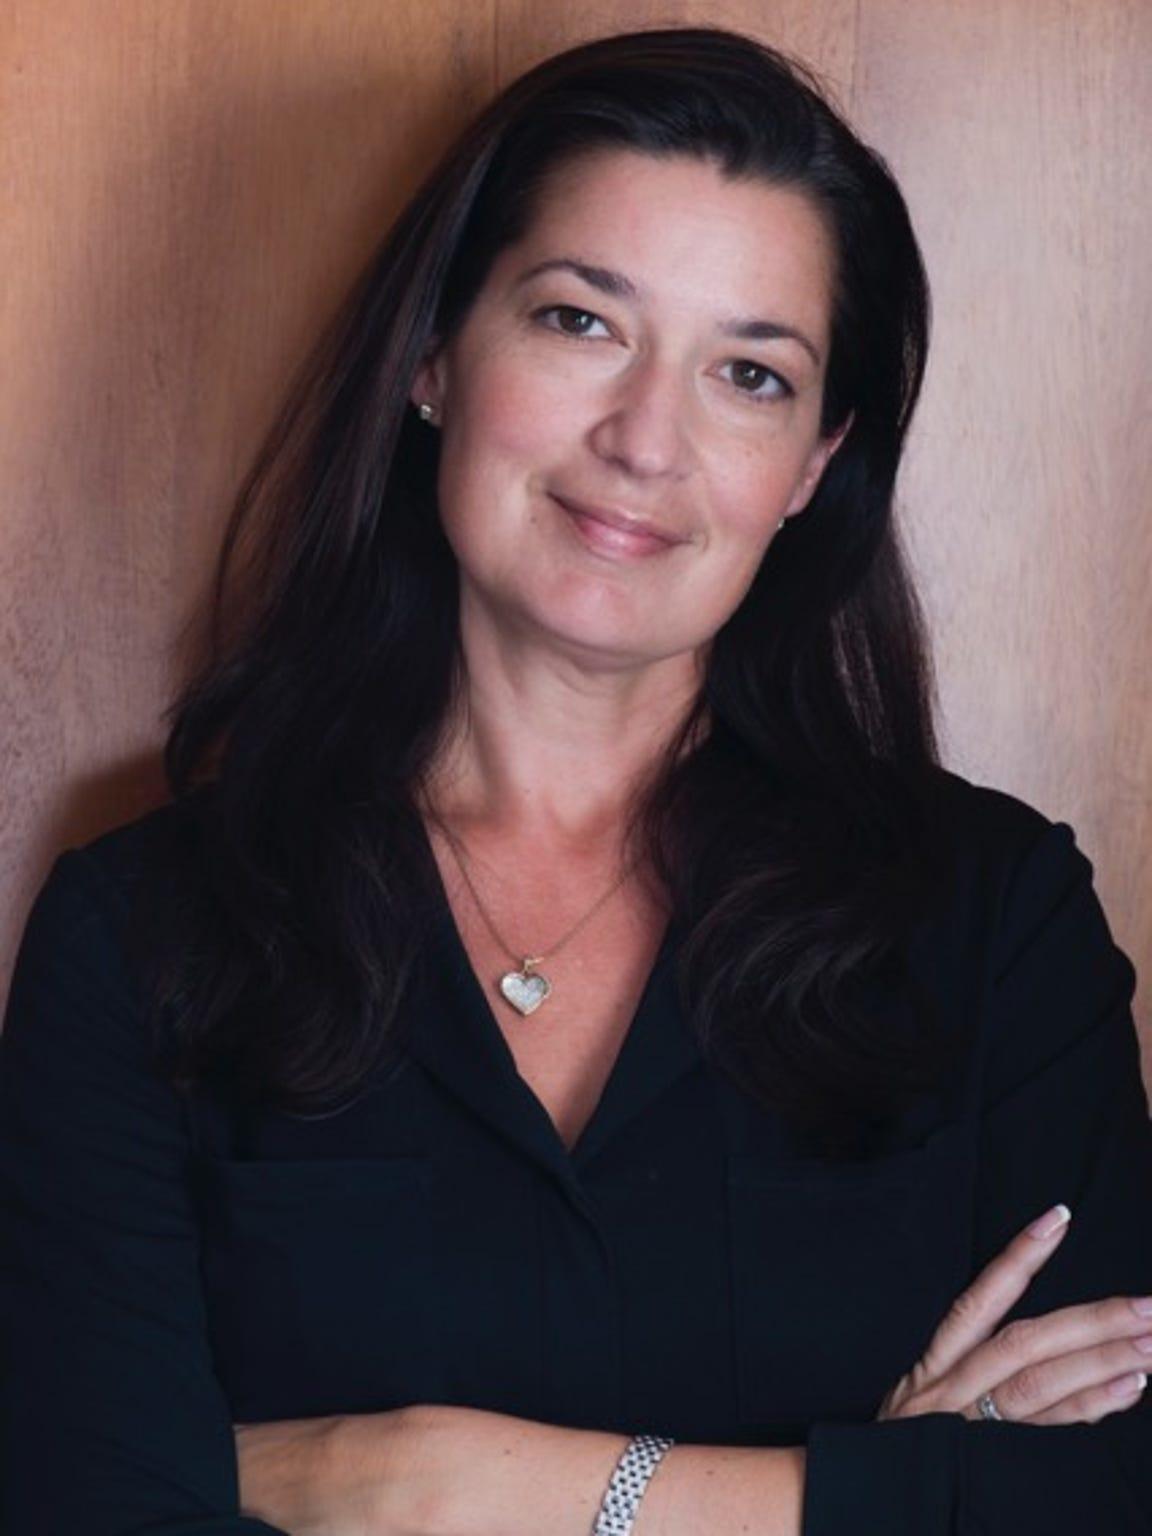 Jackie Moran, trustee with the Ventura Unified School District